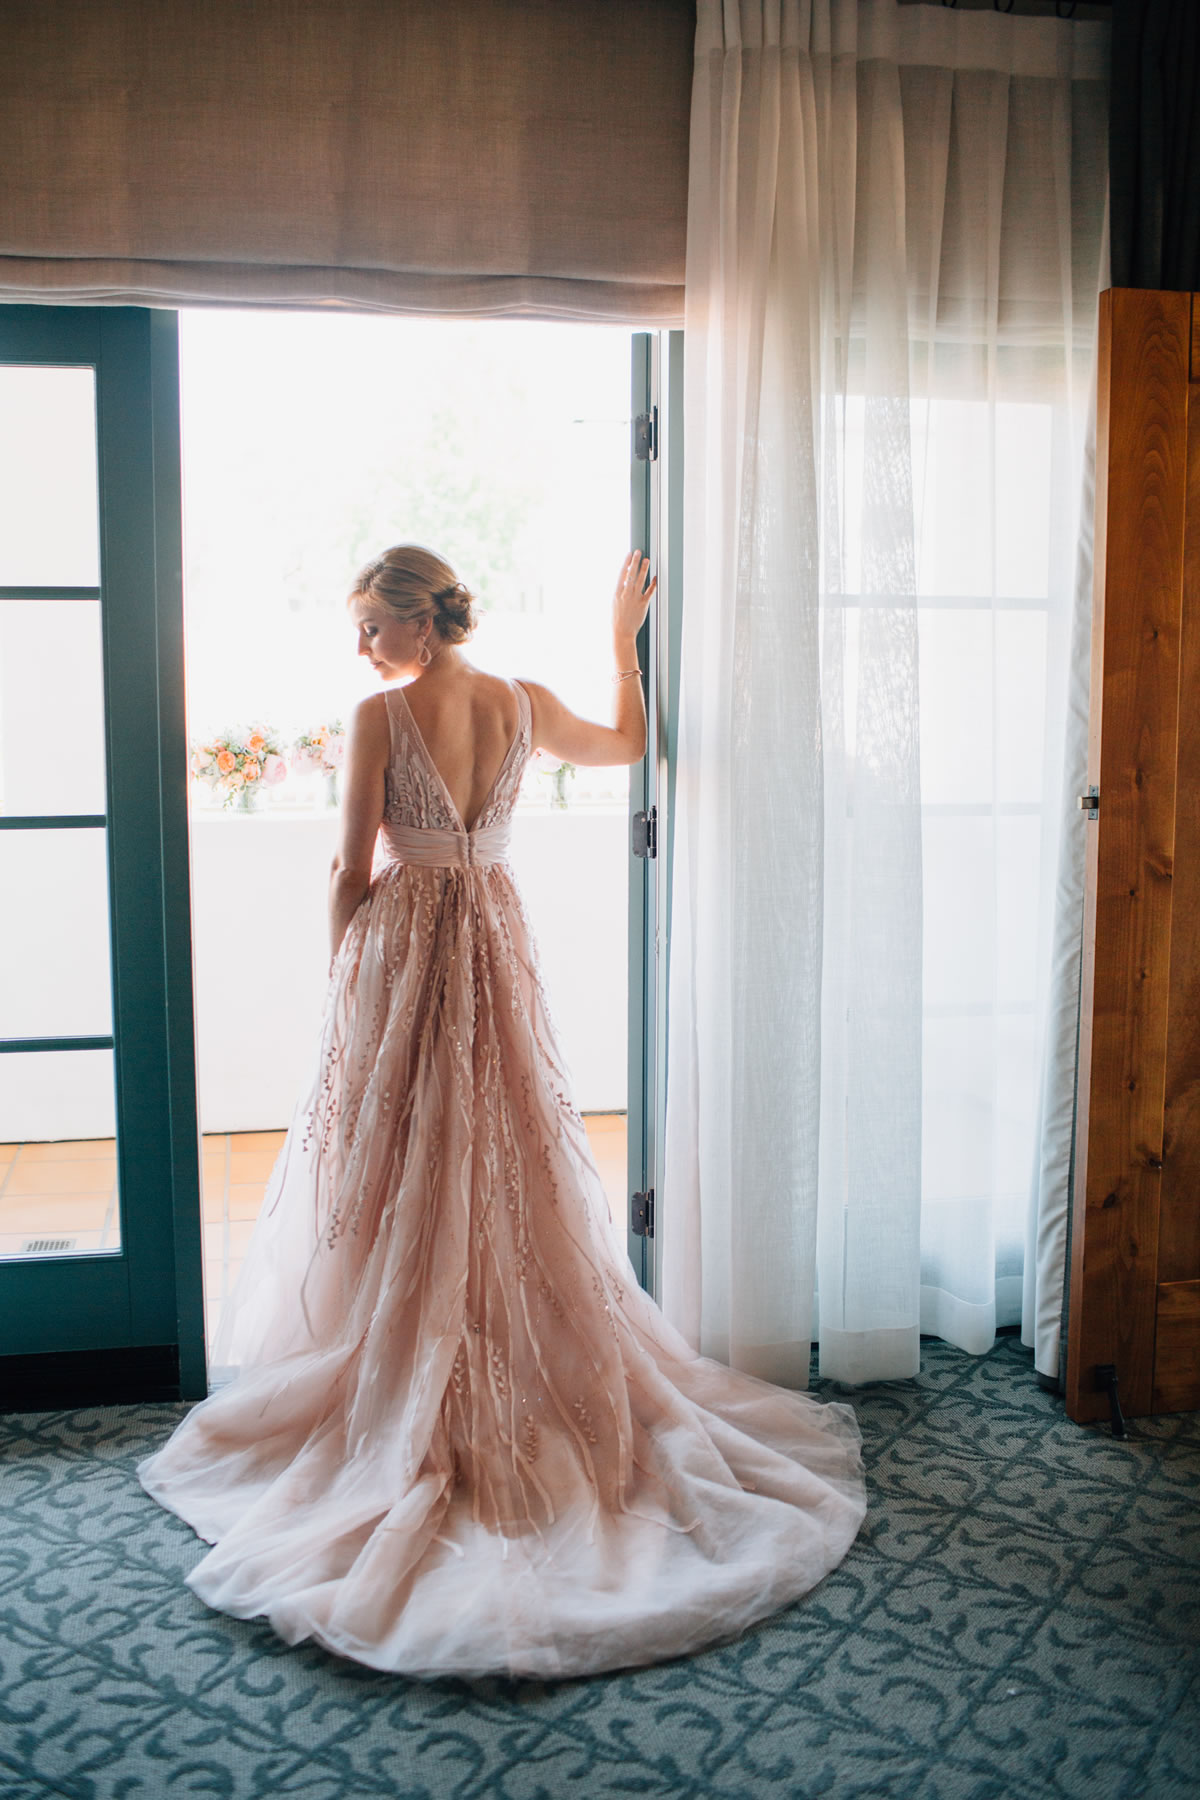 XOXO-BRIDE-Marianne-Wilson-Photography-JD-formals-013-3354067166-O